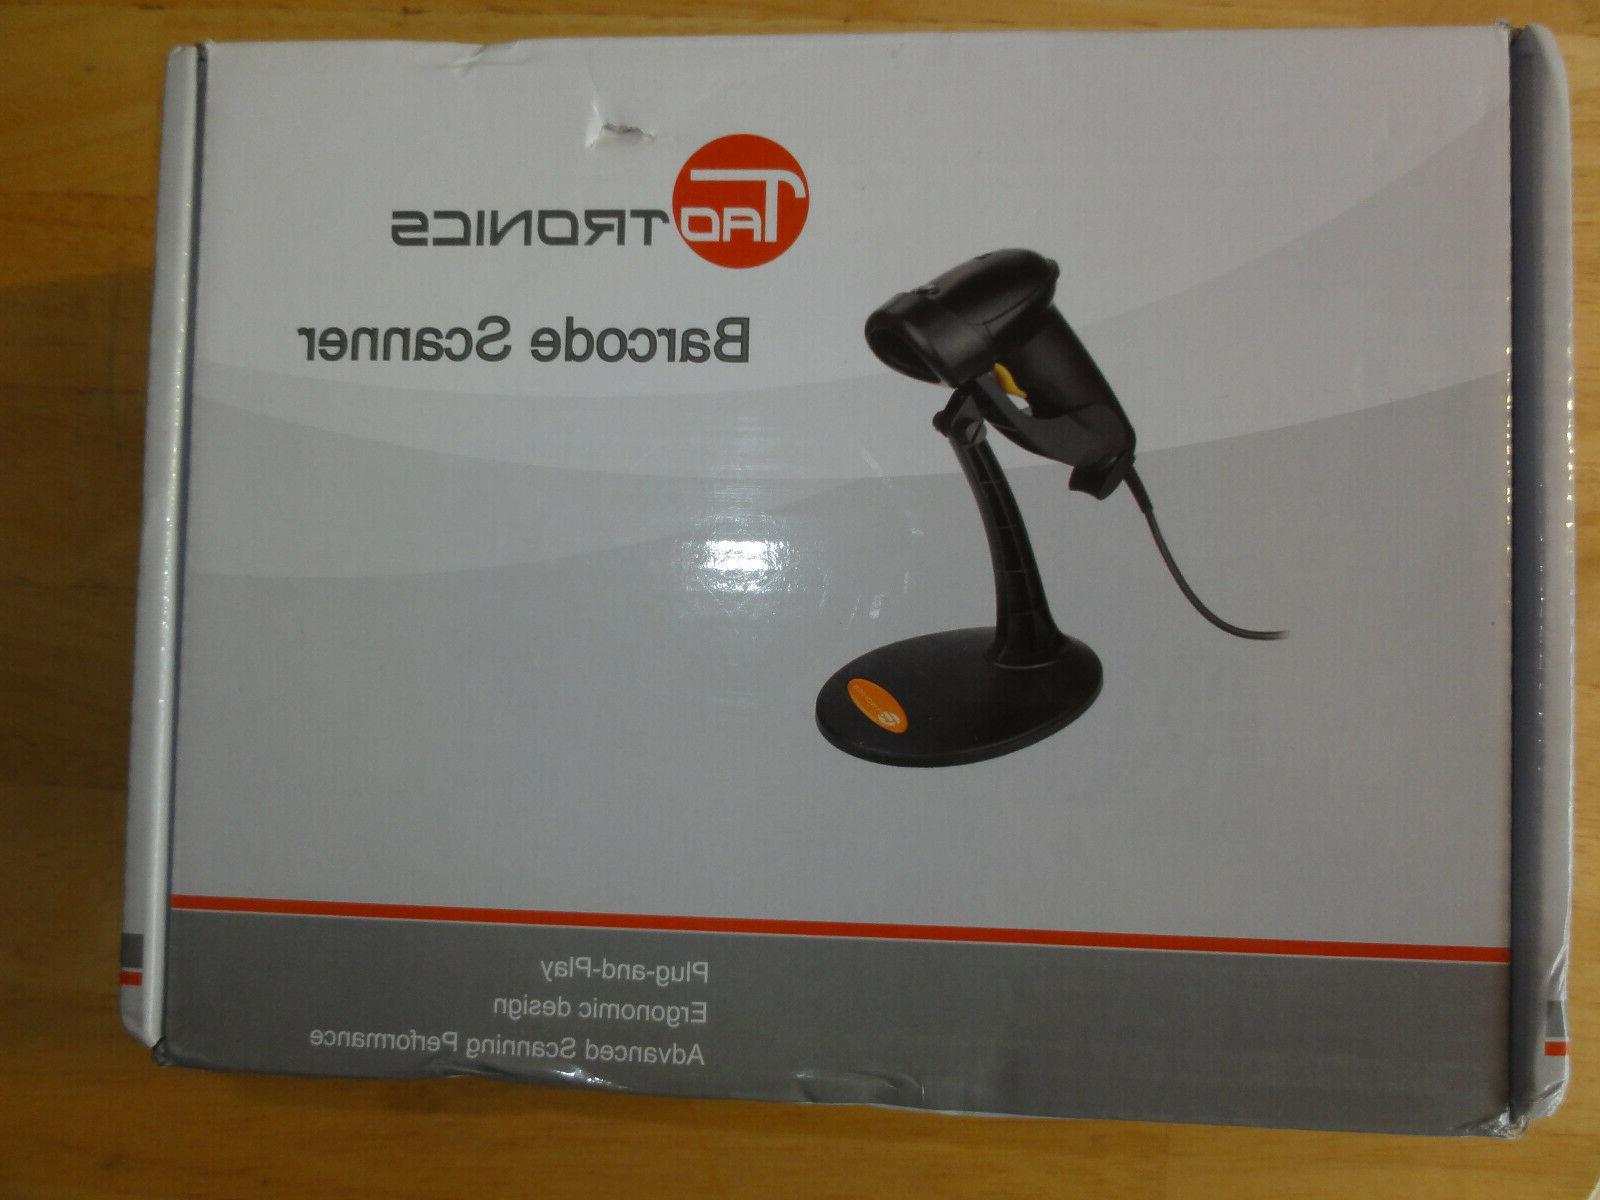 new usb barcode scanner wired handheld laser